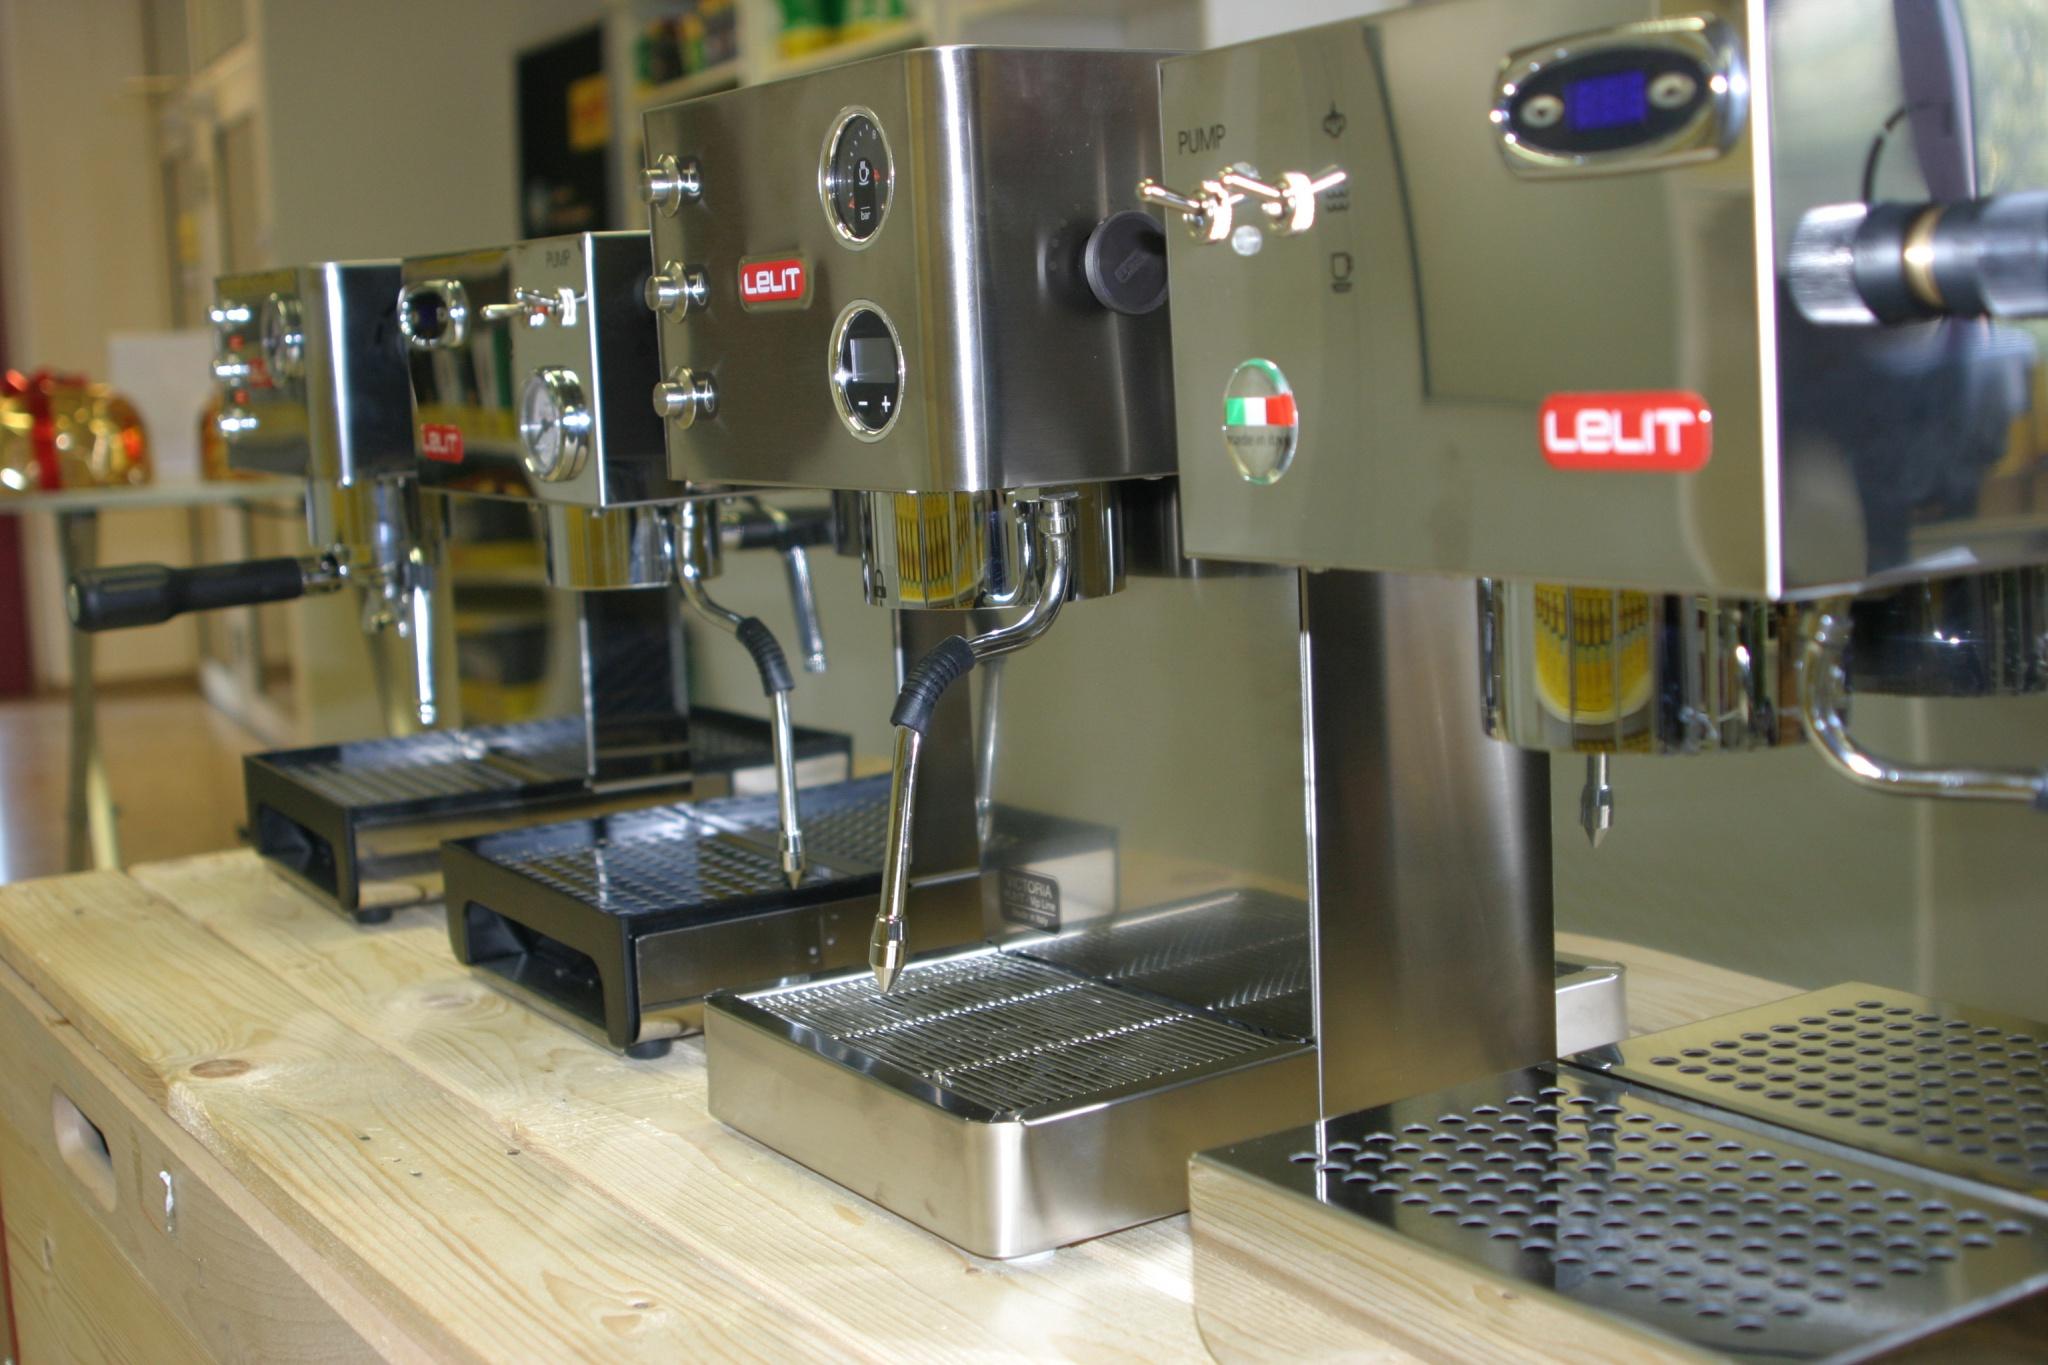 comment faire un espresso